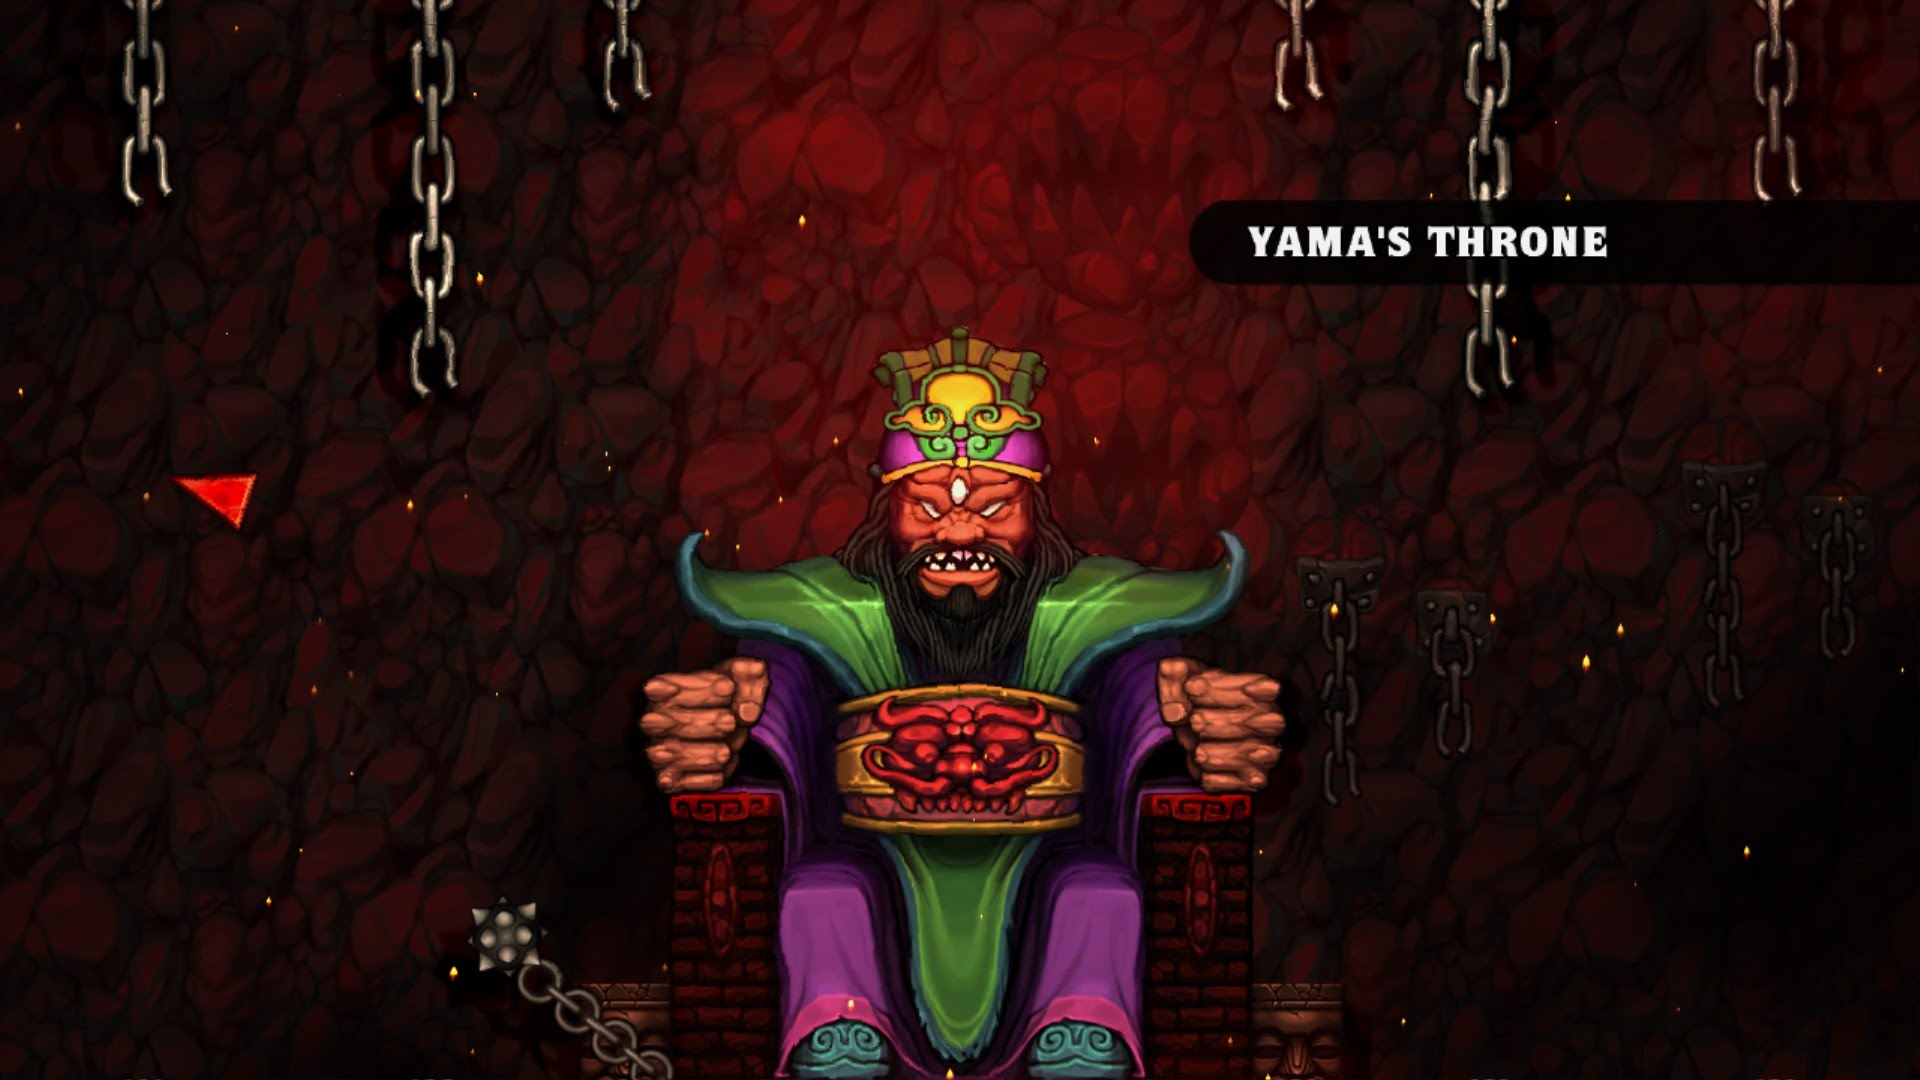 Yama's Throne